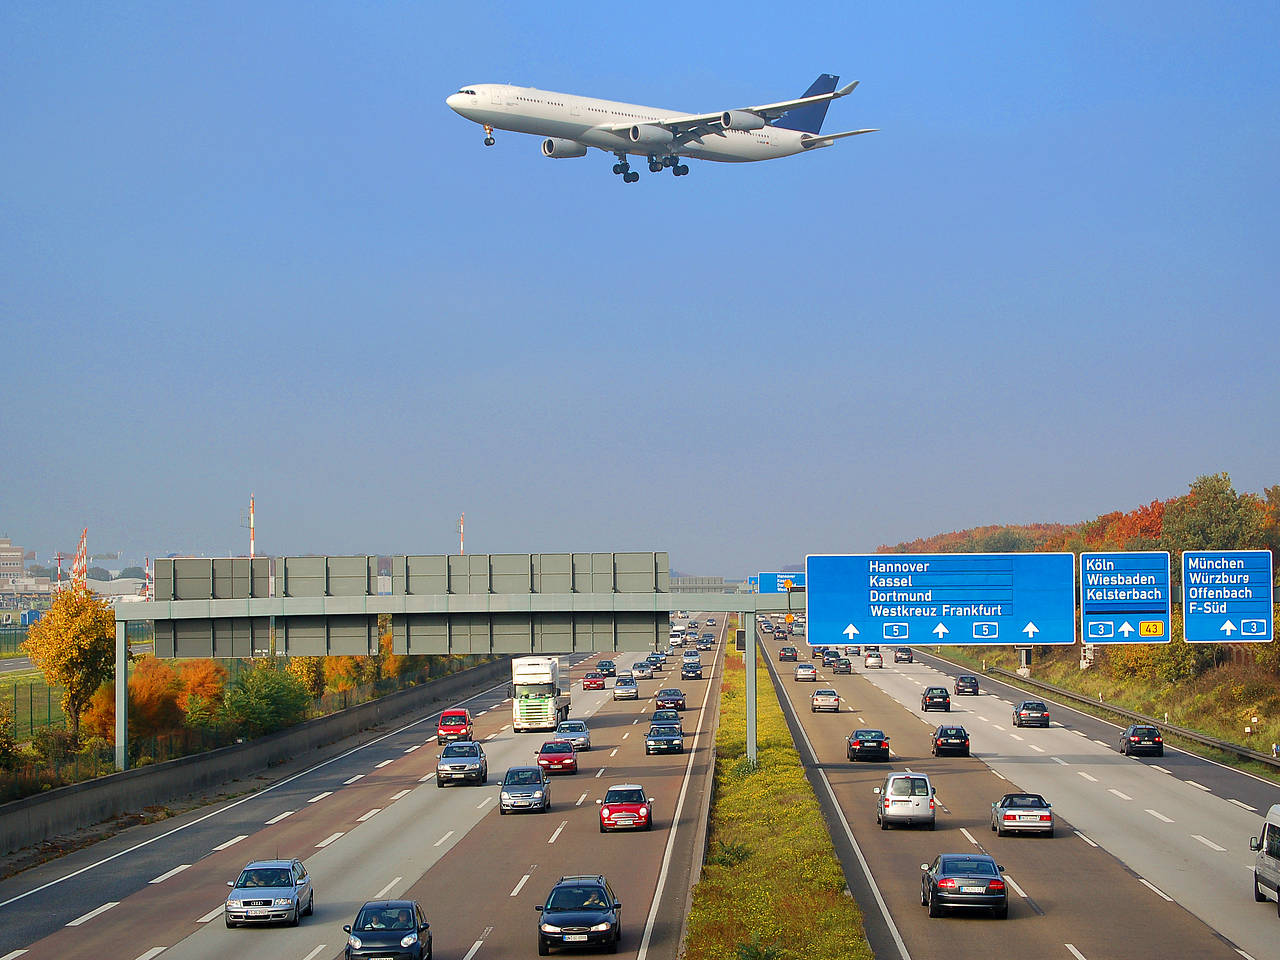 Flughafen Frankfirt